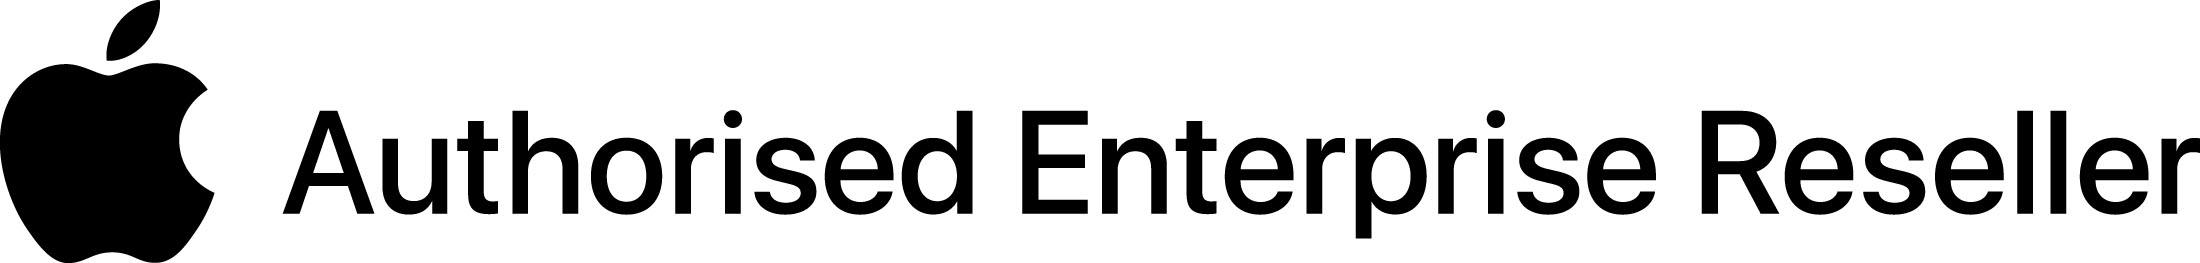 Apple Authorised Enterprise Reseller